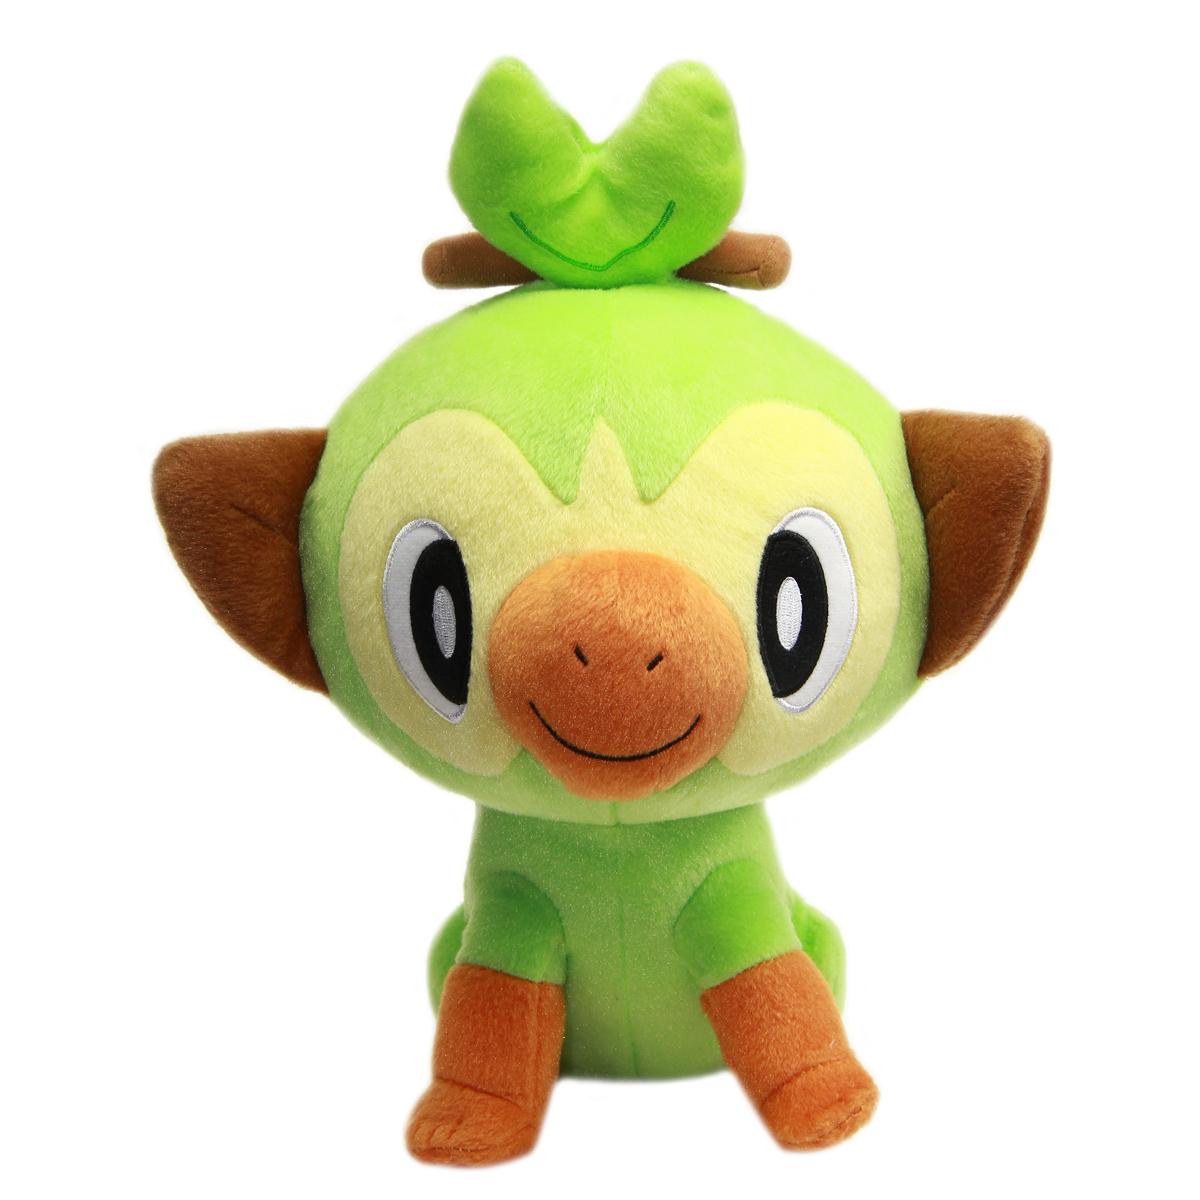 Pokemon Grookey Plush Doll 10 Inches Bandai Spirits Banpresto